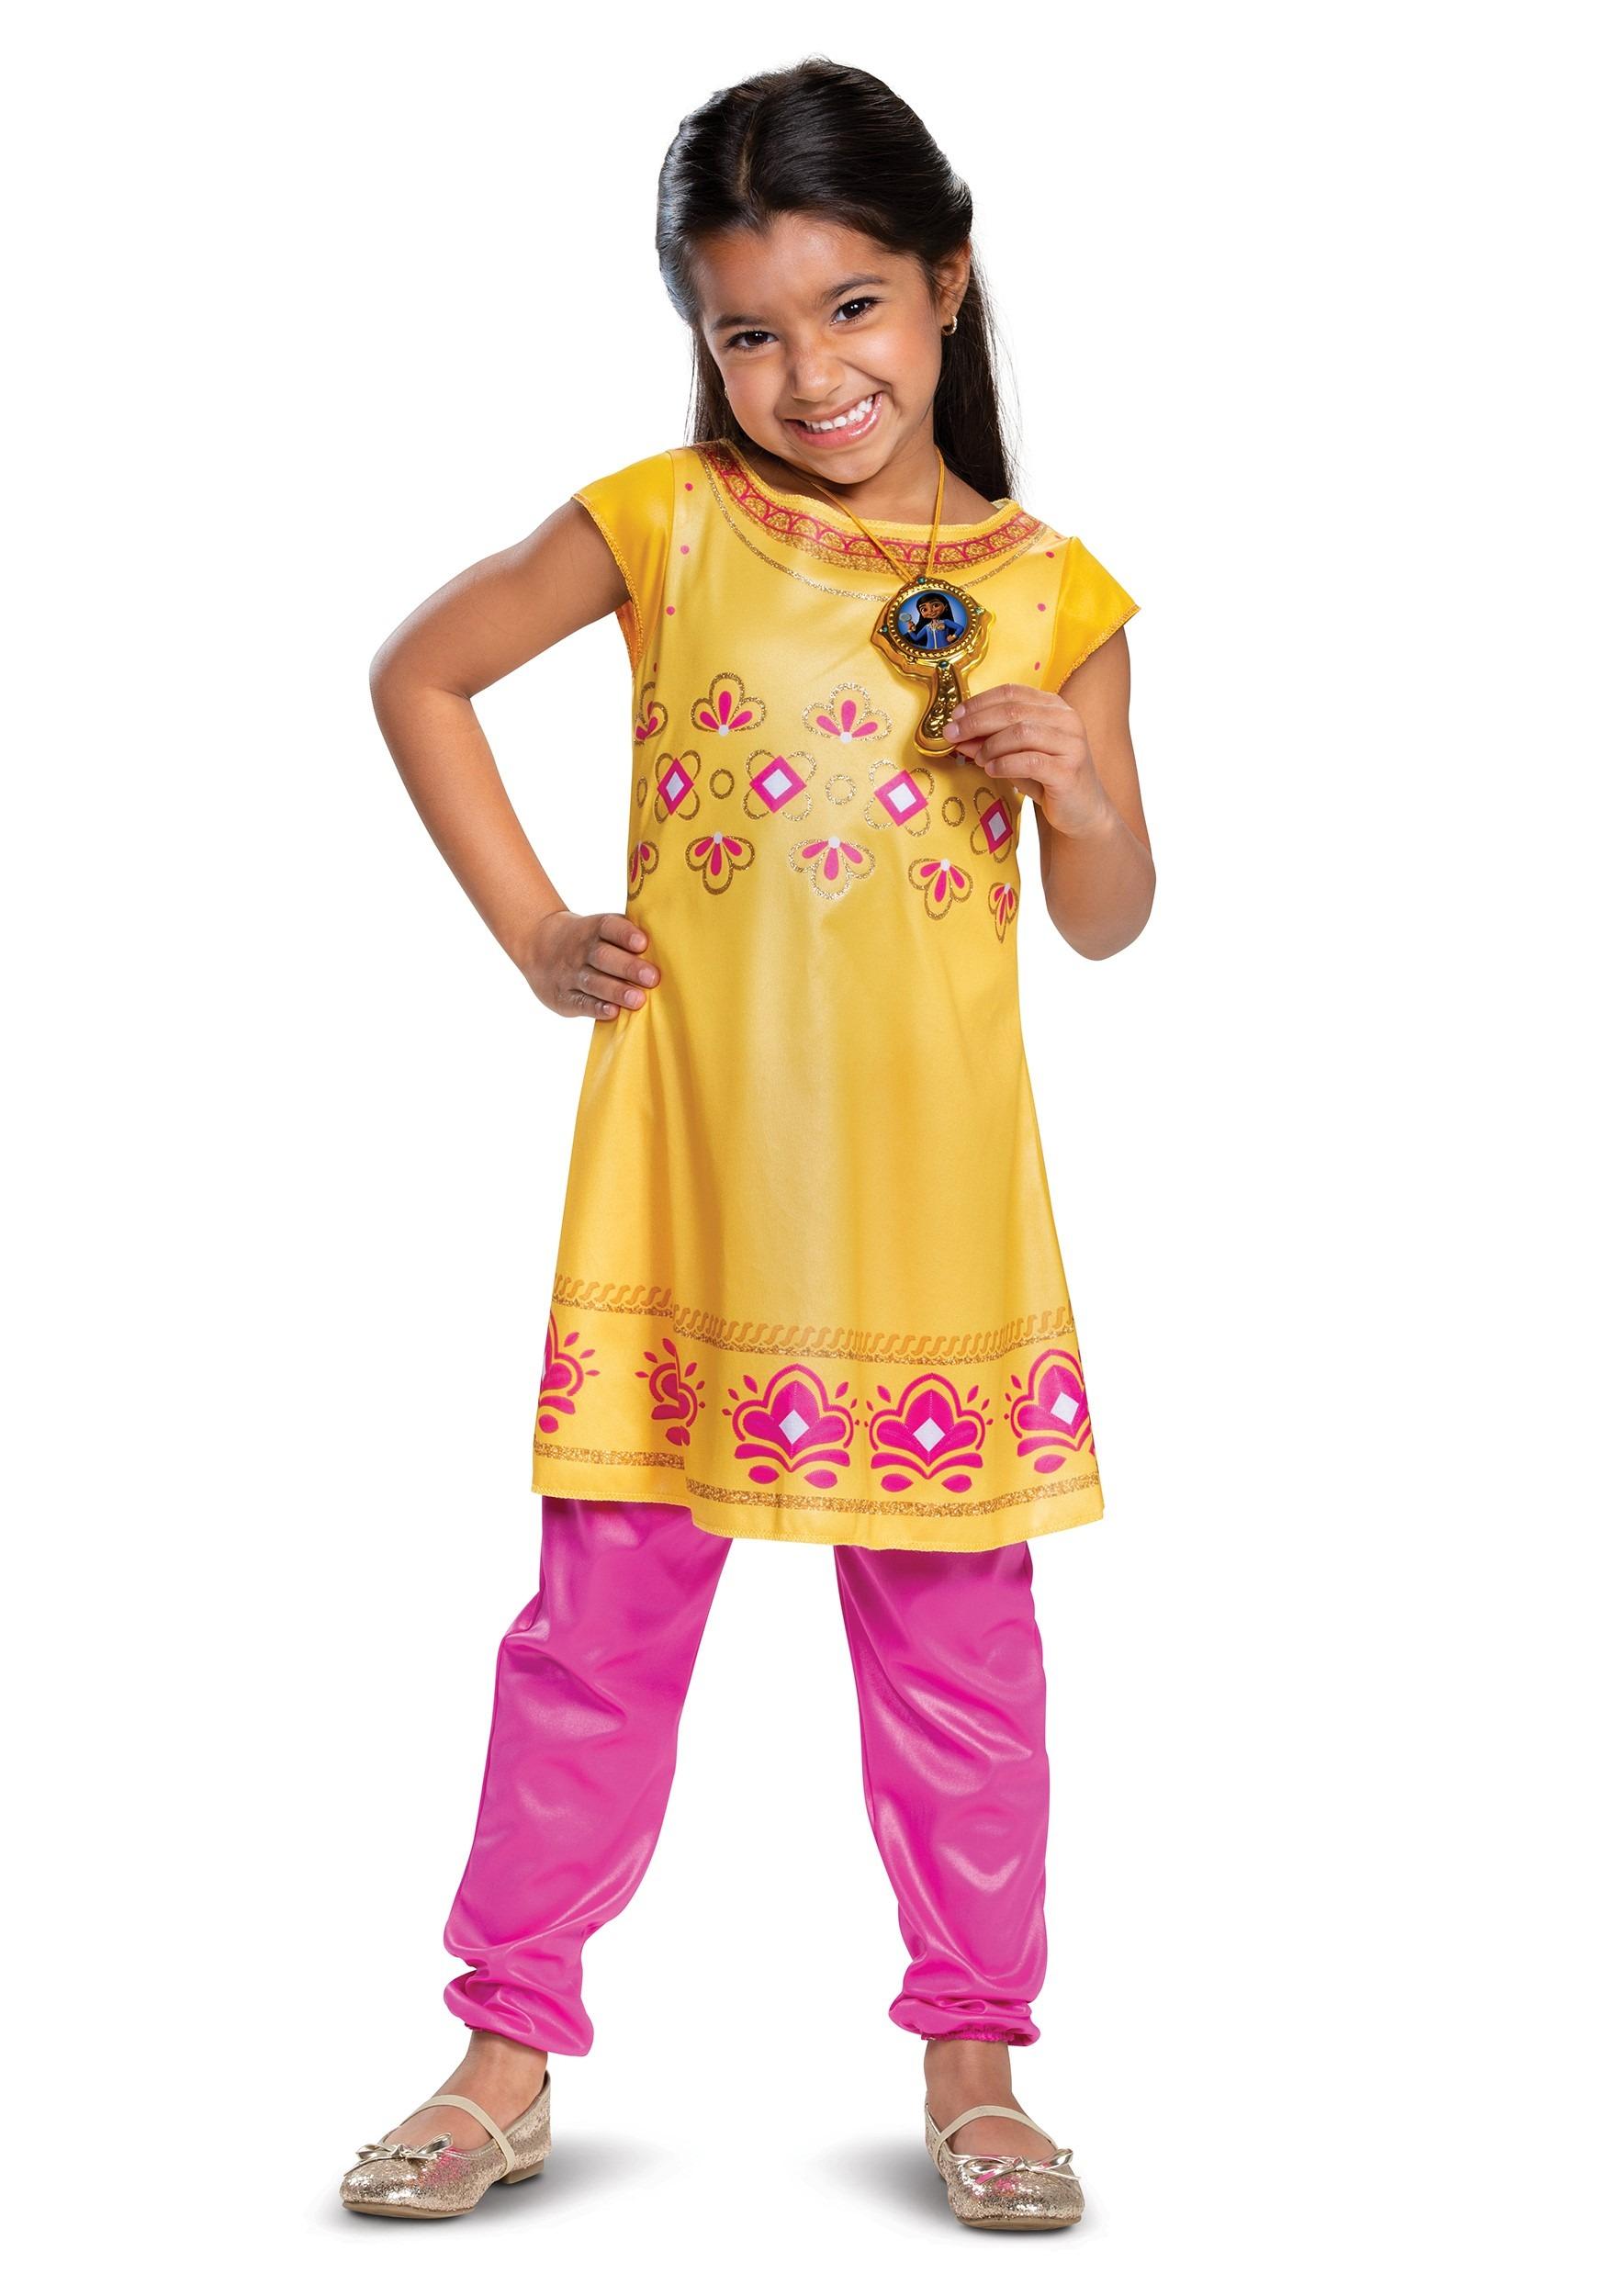 Mira Royal Detective Toddler Costume